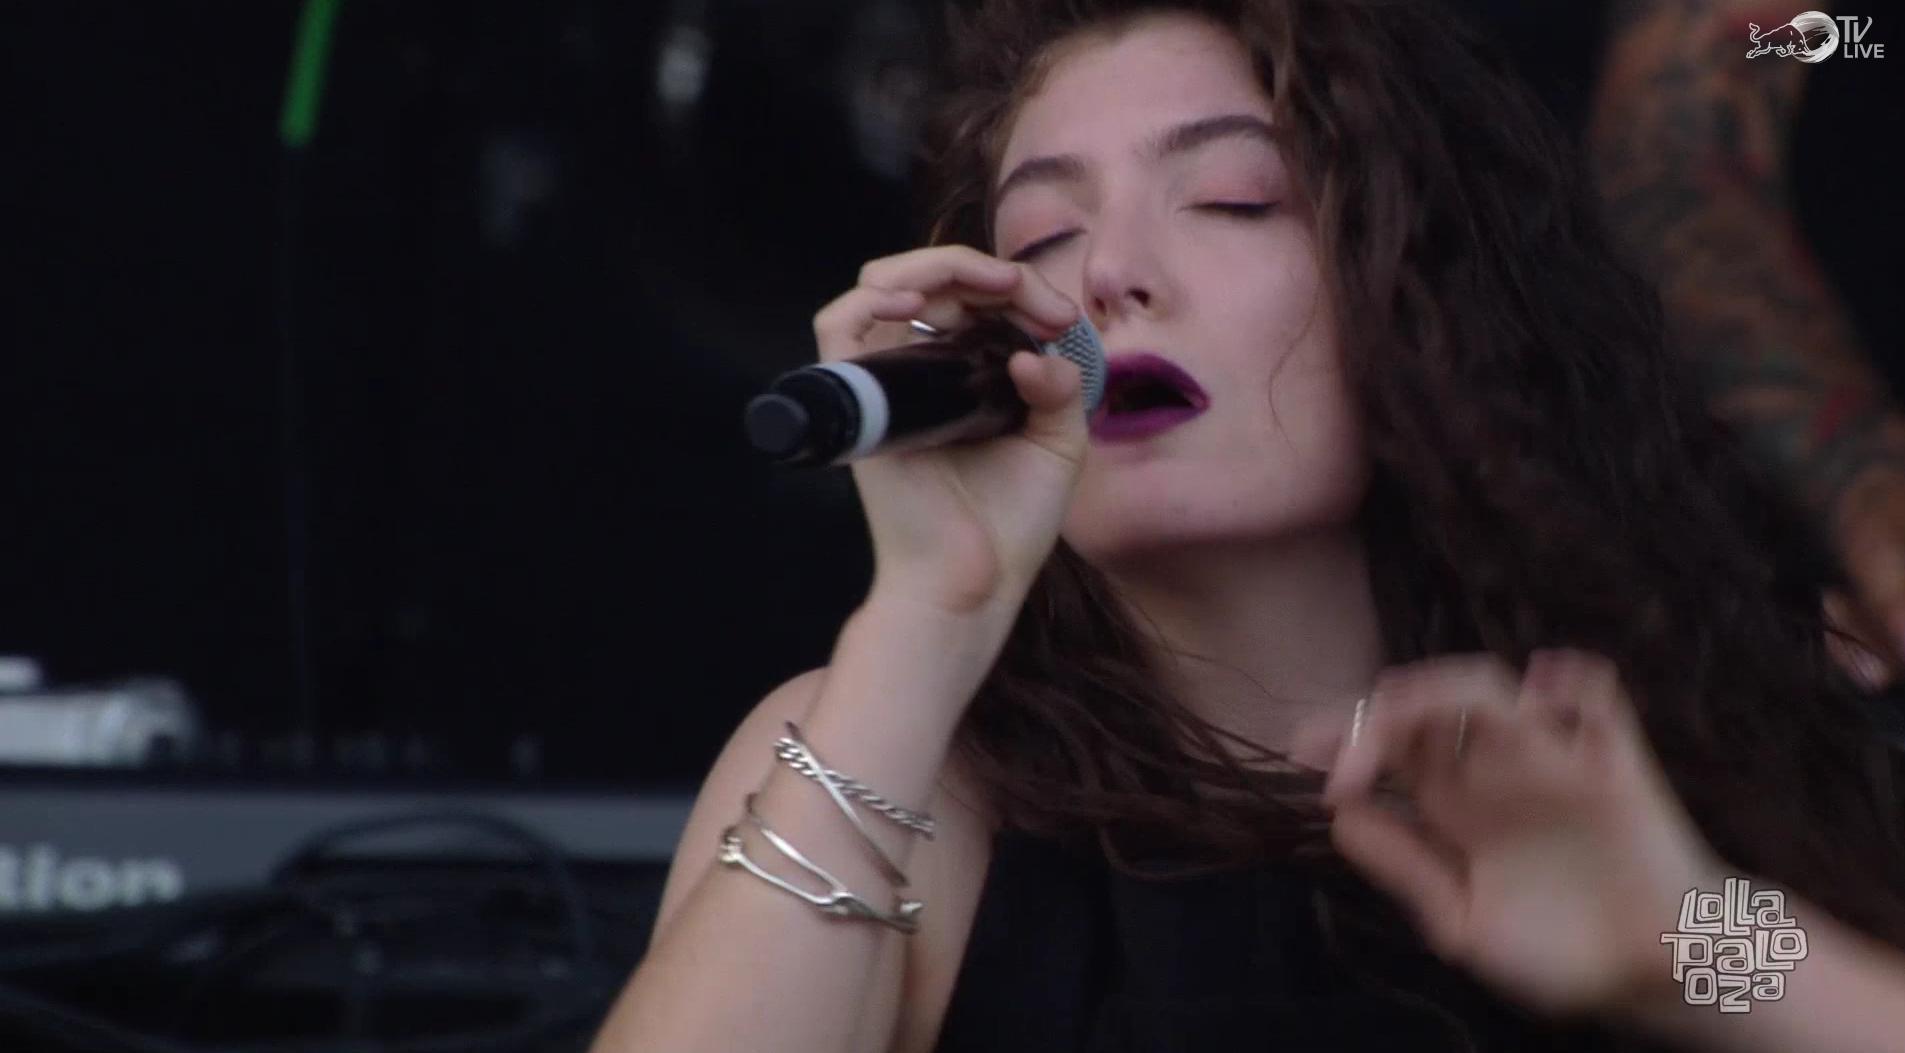 Lollapalooza Livestream – Artist Videos & Performances – Red Bull TV